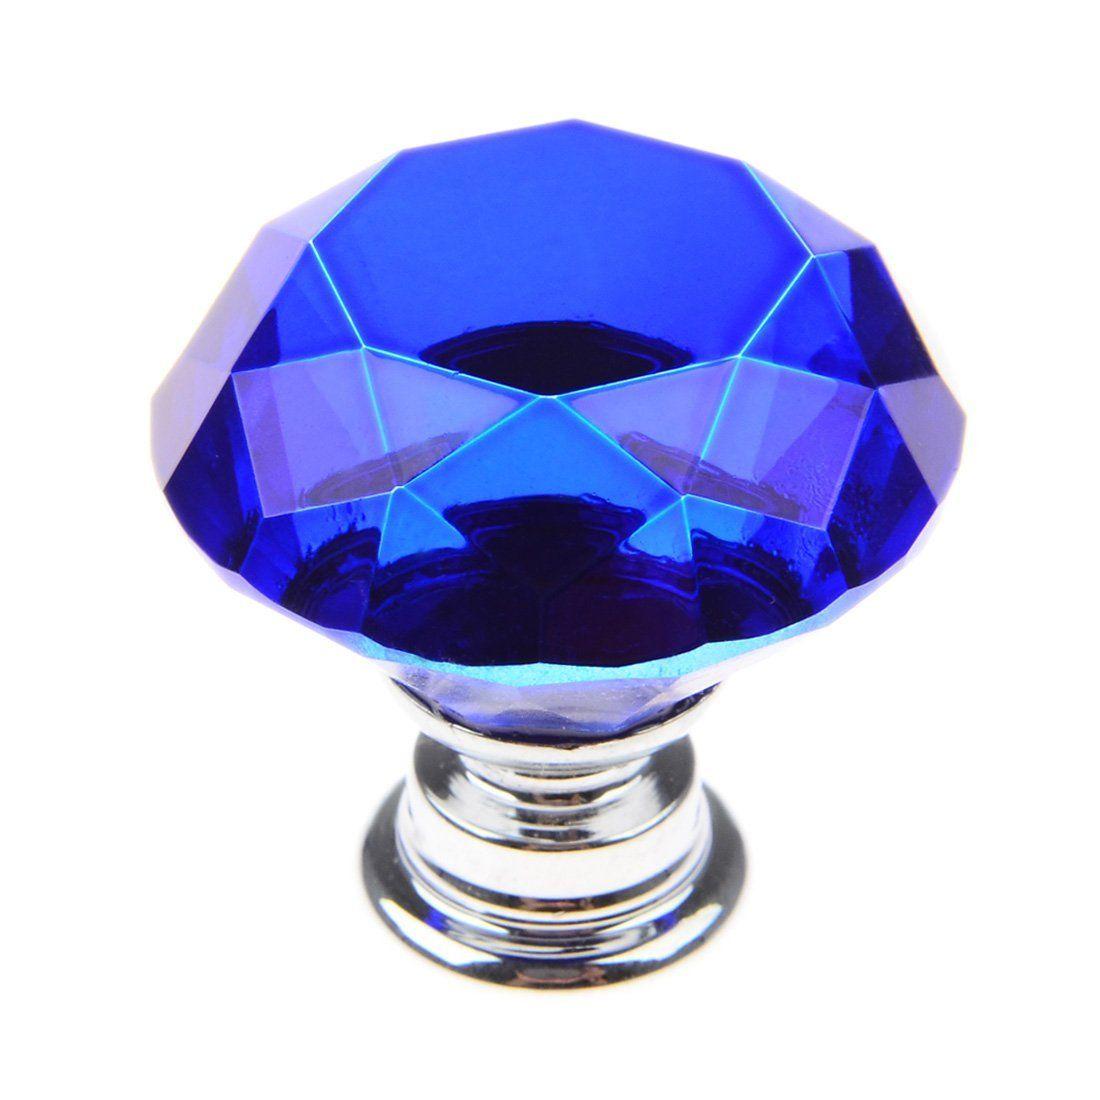 30mm Crystal Glass Diamond Shape Cabinet Knobs Cupboard Drawer Pull Handles - Dark Blue